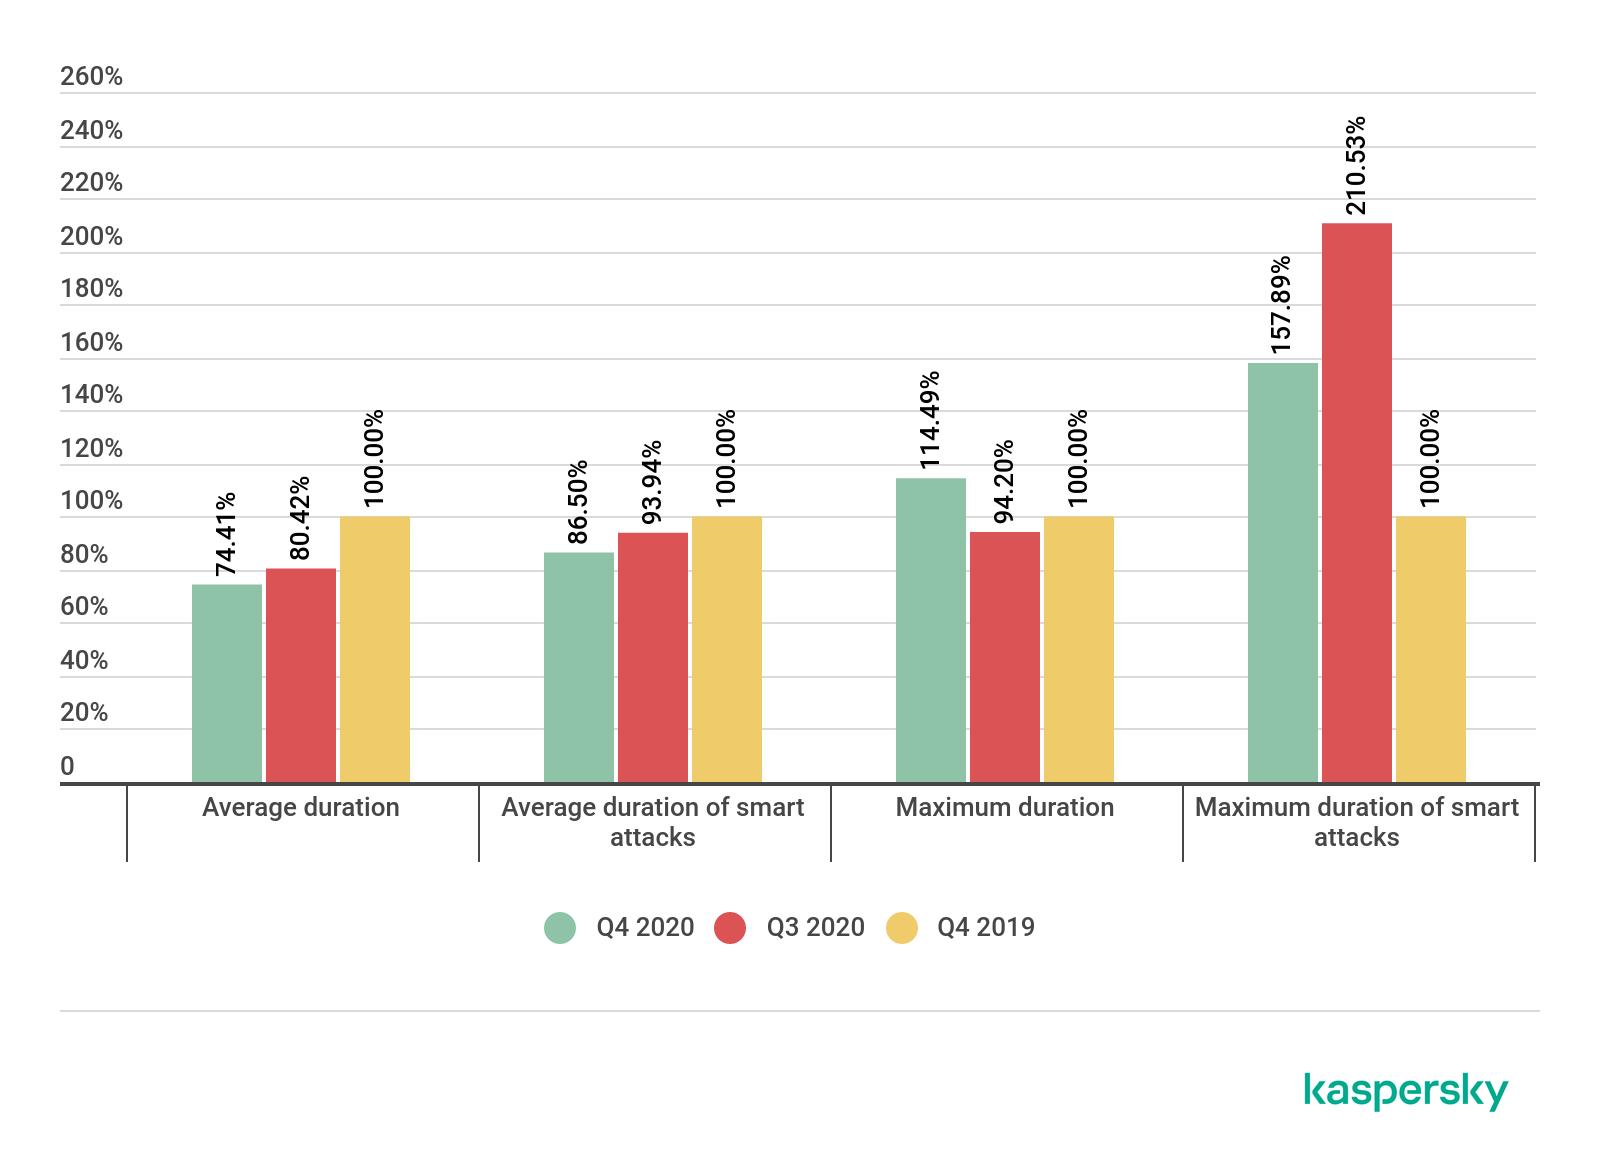 DDoS attacks in Q4 2020